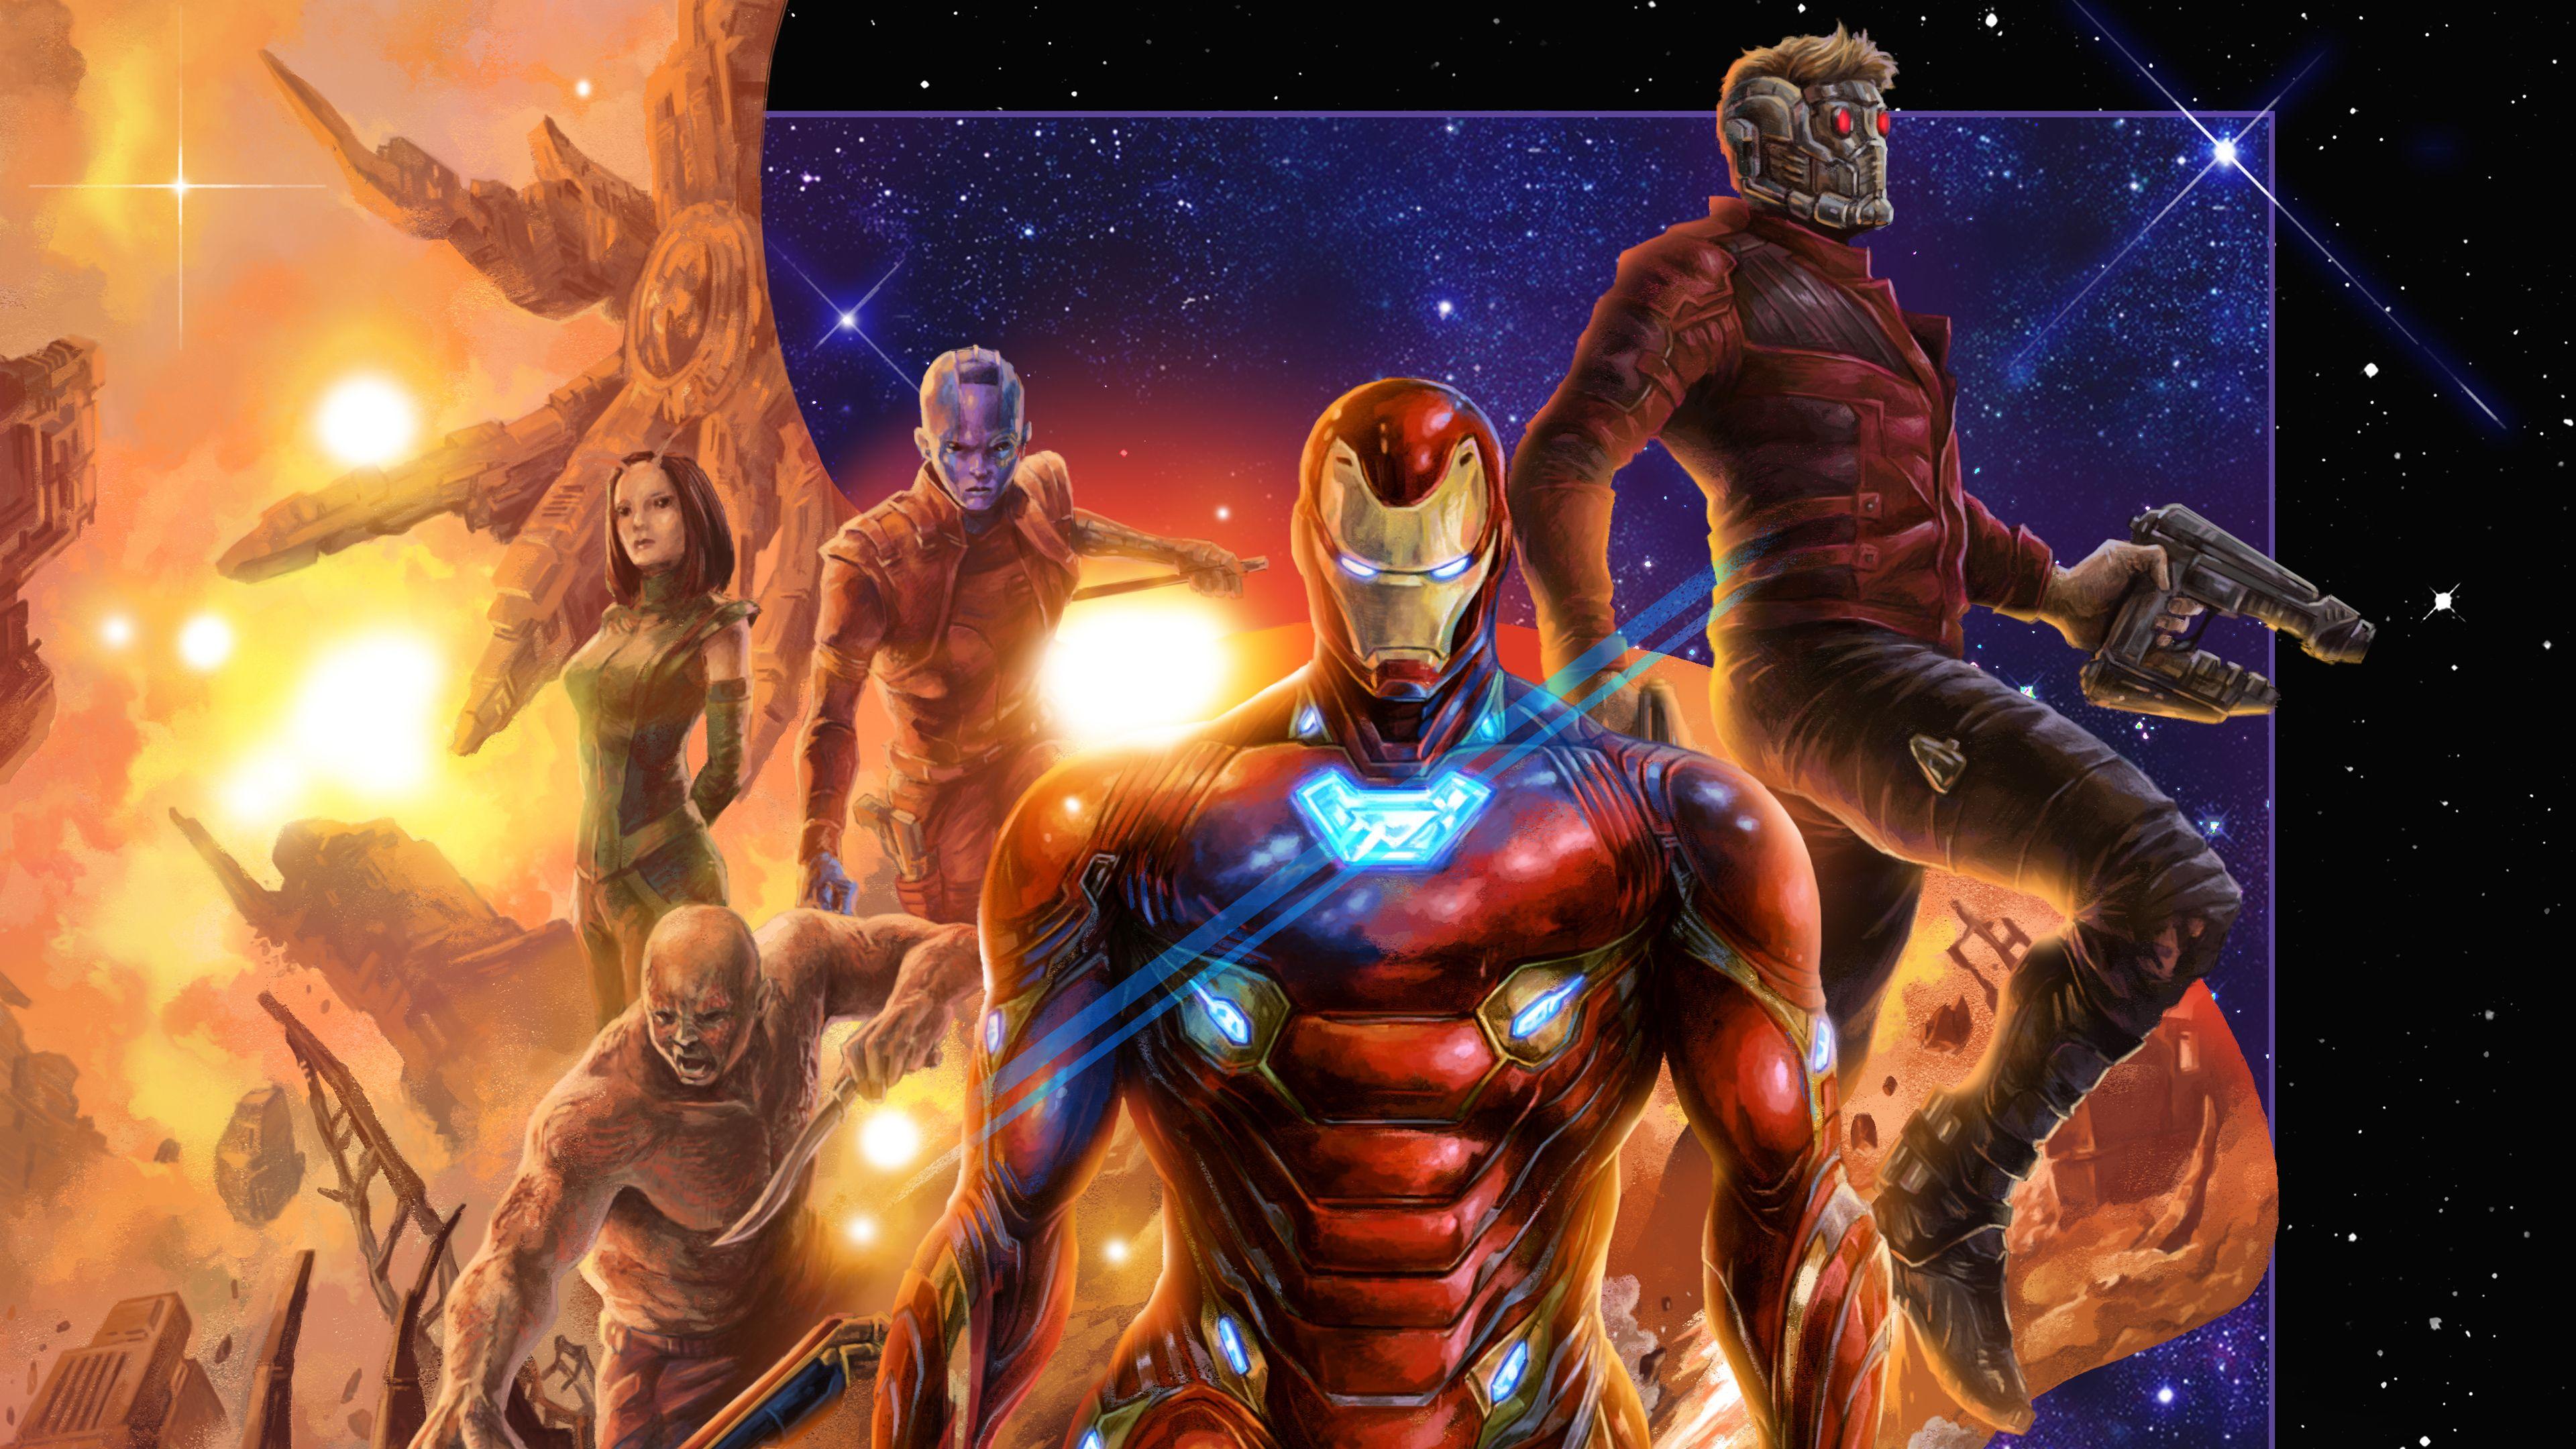 Avengers Infinity War 4k Artworks Superheroes Wallpapers Star Lord Wallpapers Iron Man Wallpapers Hd Wallp Iron Man Wallpaper Avengers Infinity War Avengers